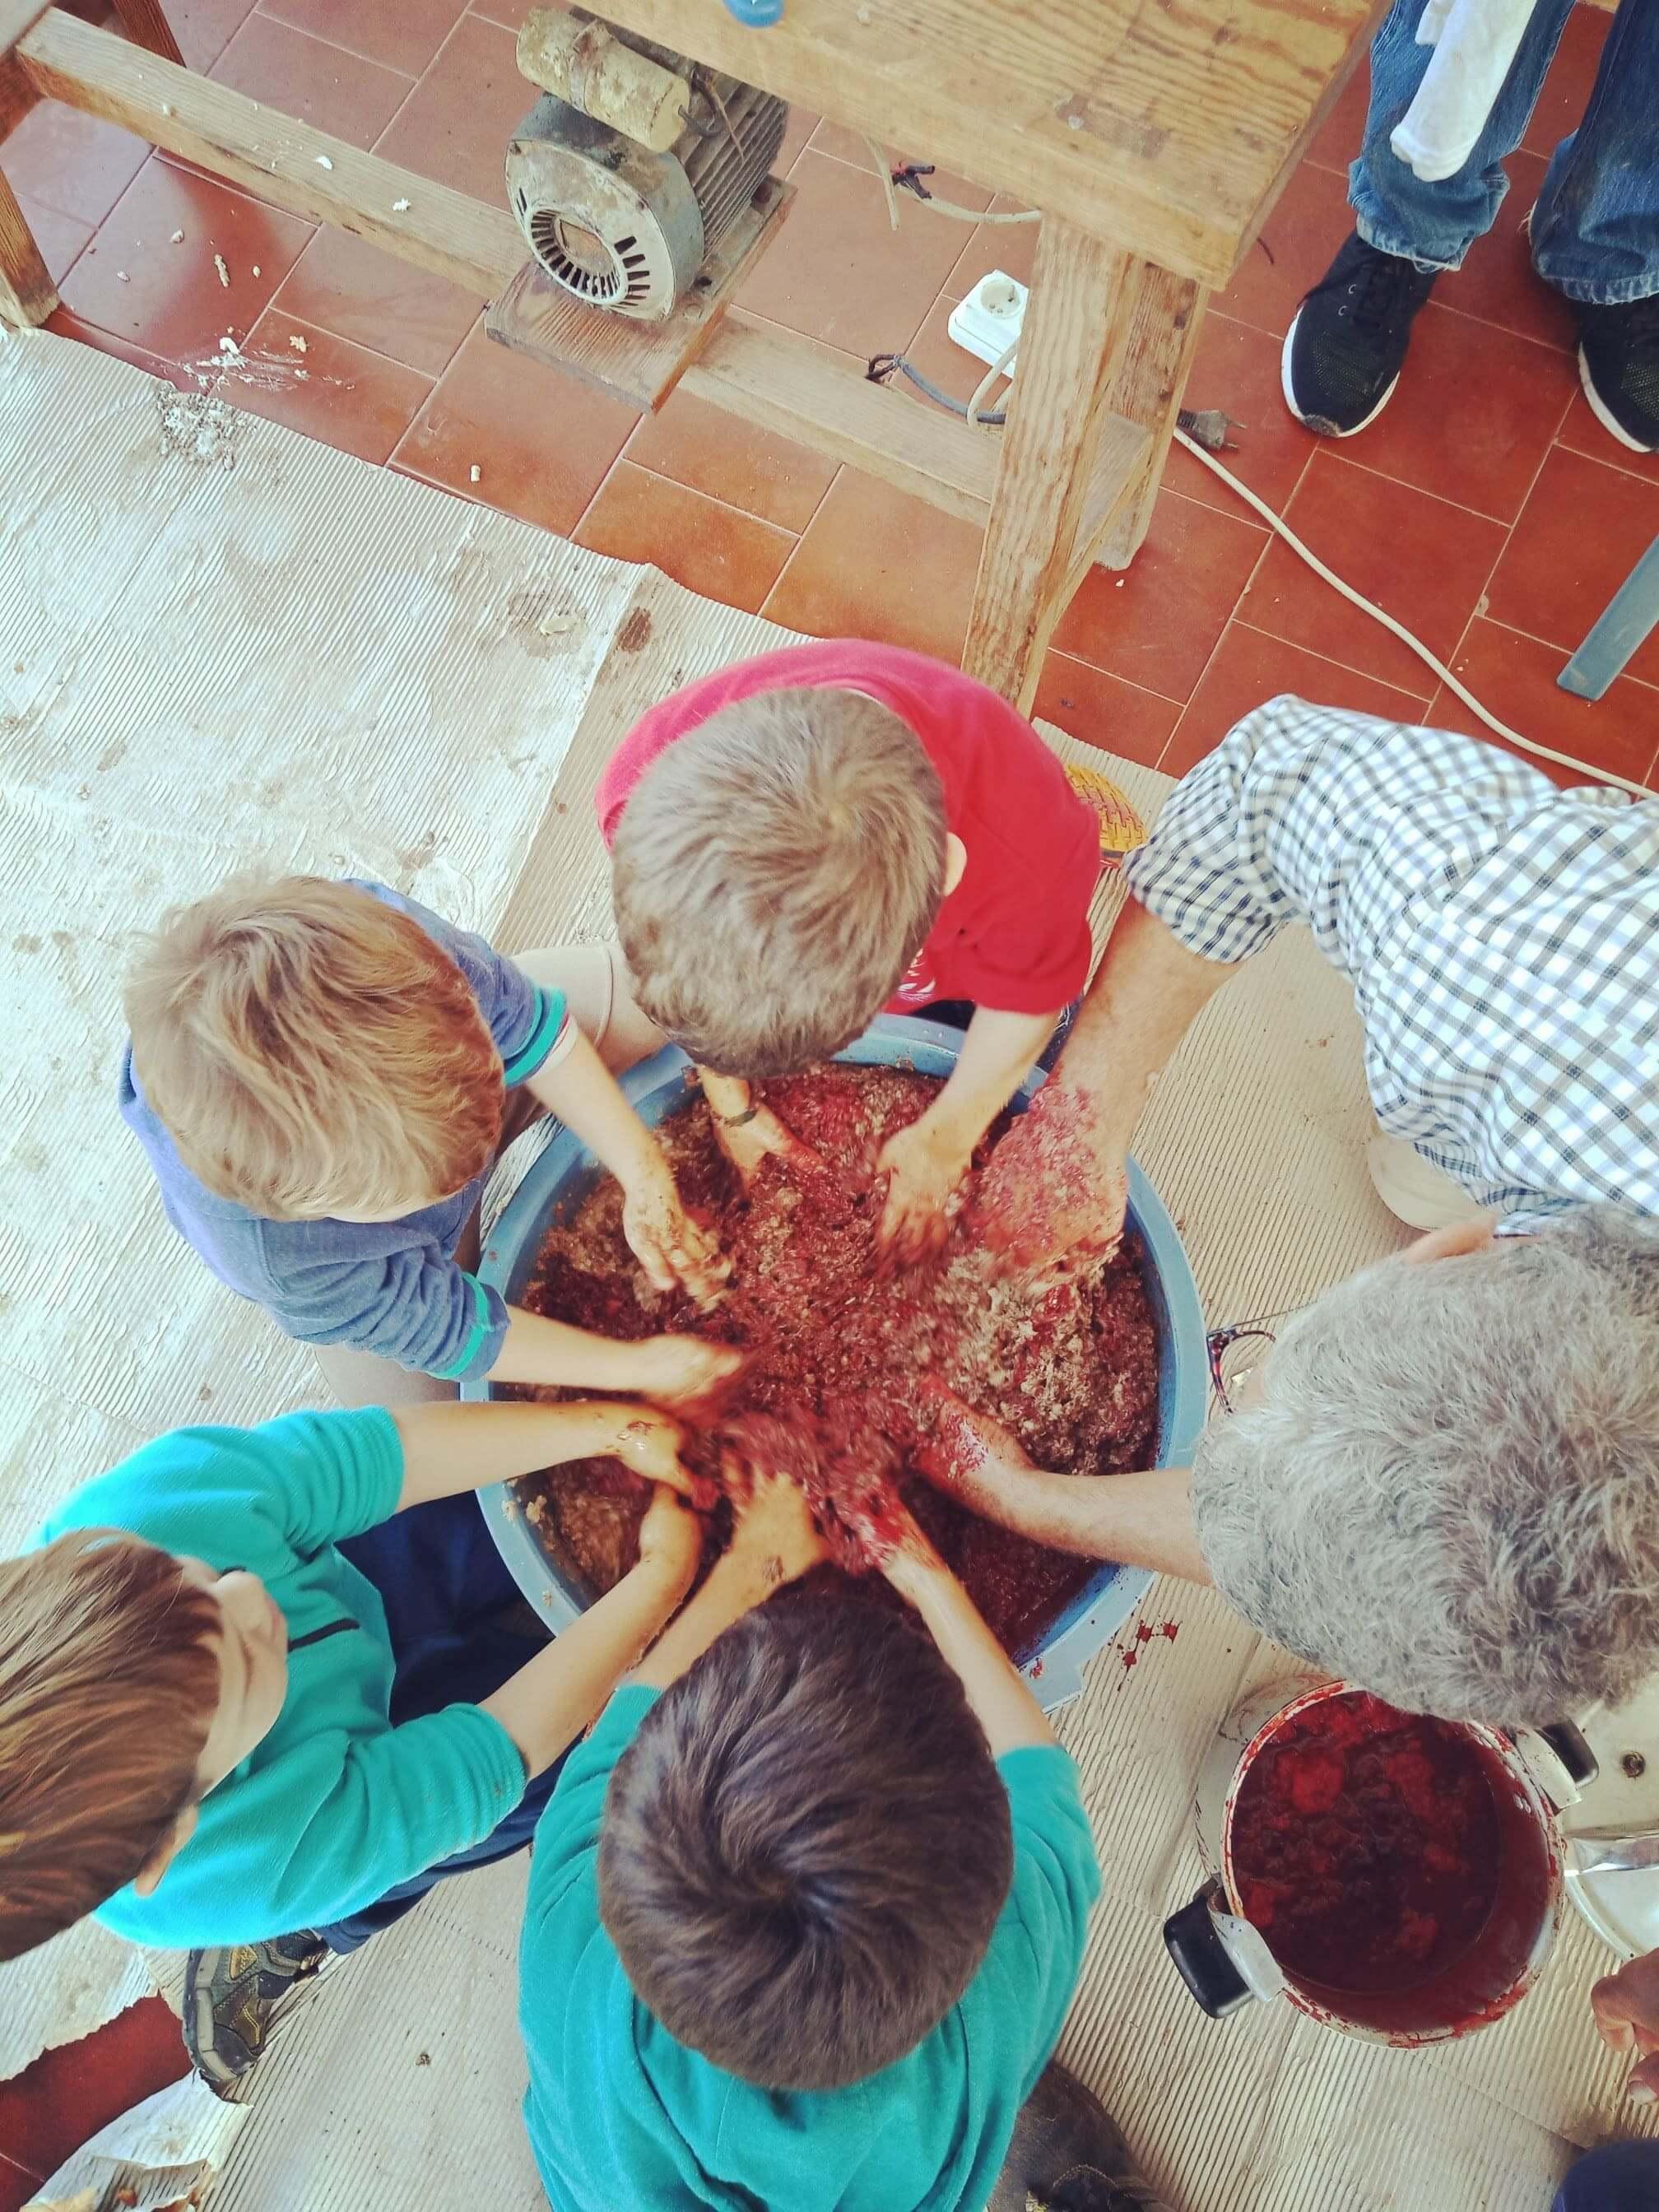 Everyone helping make sobrasada 3 min